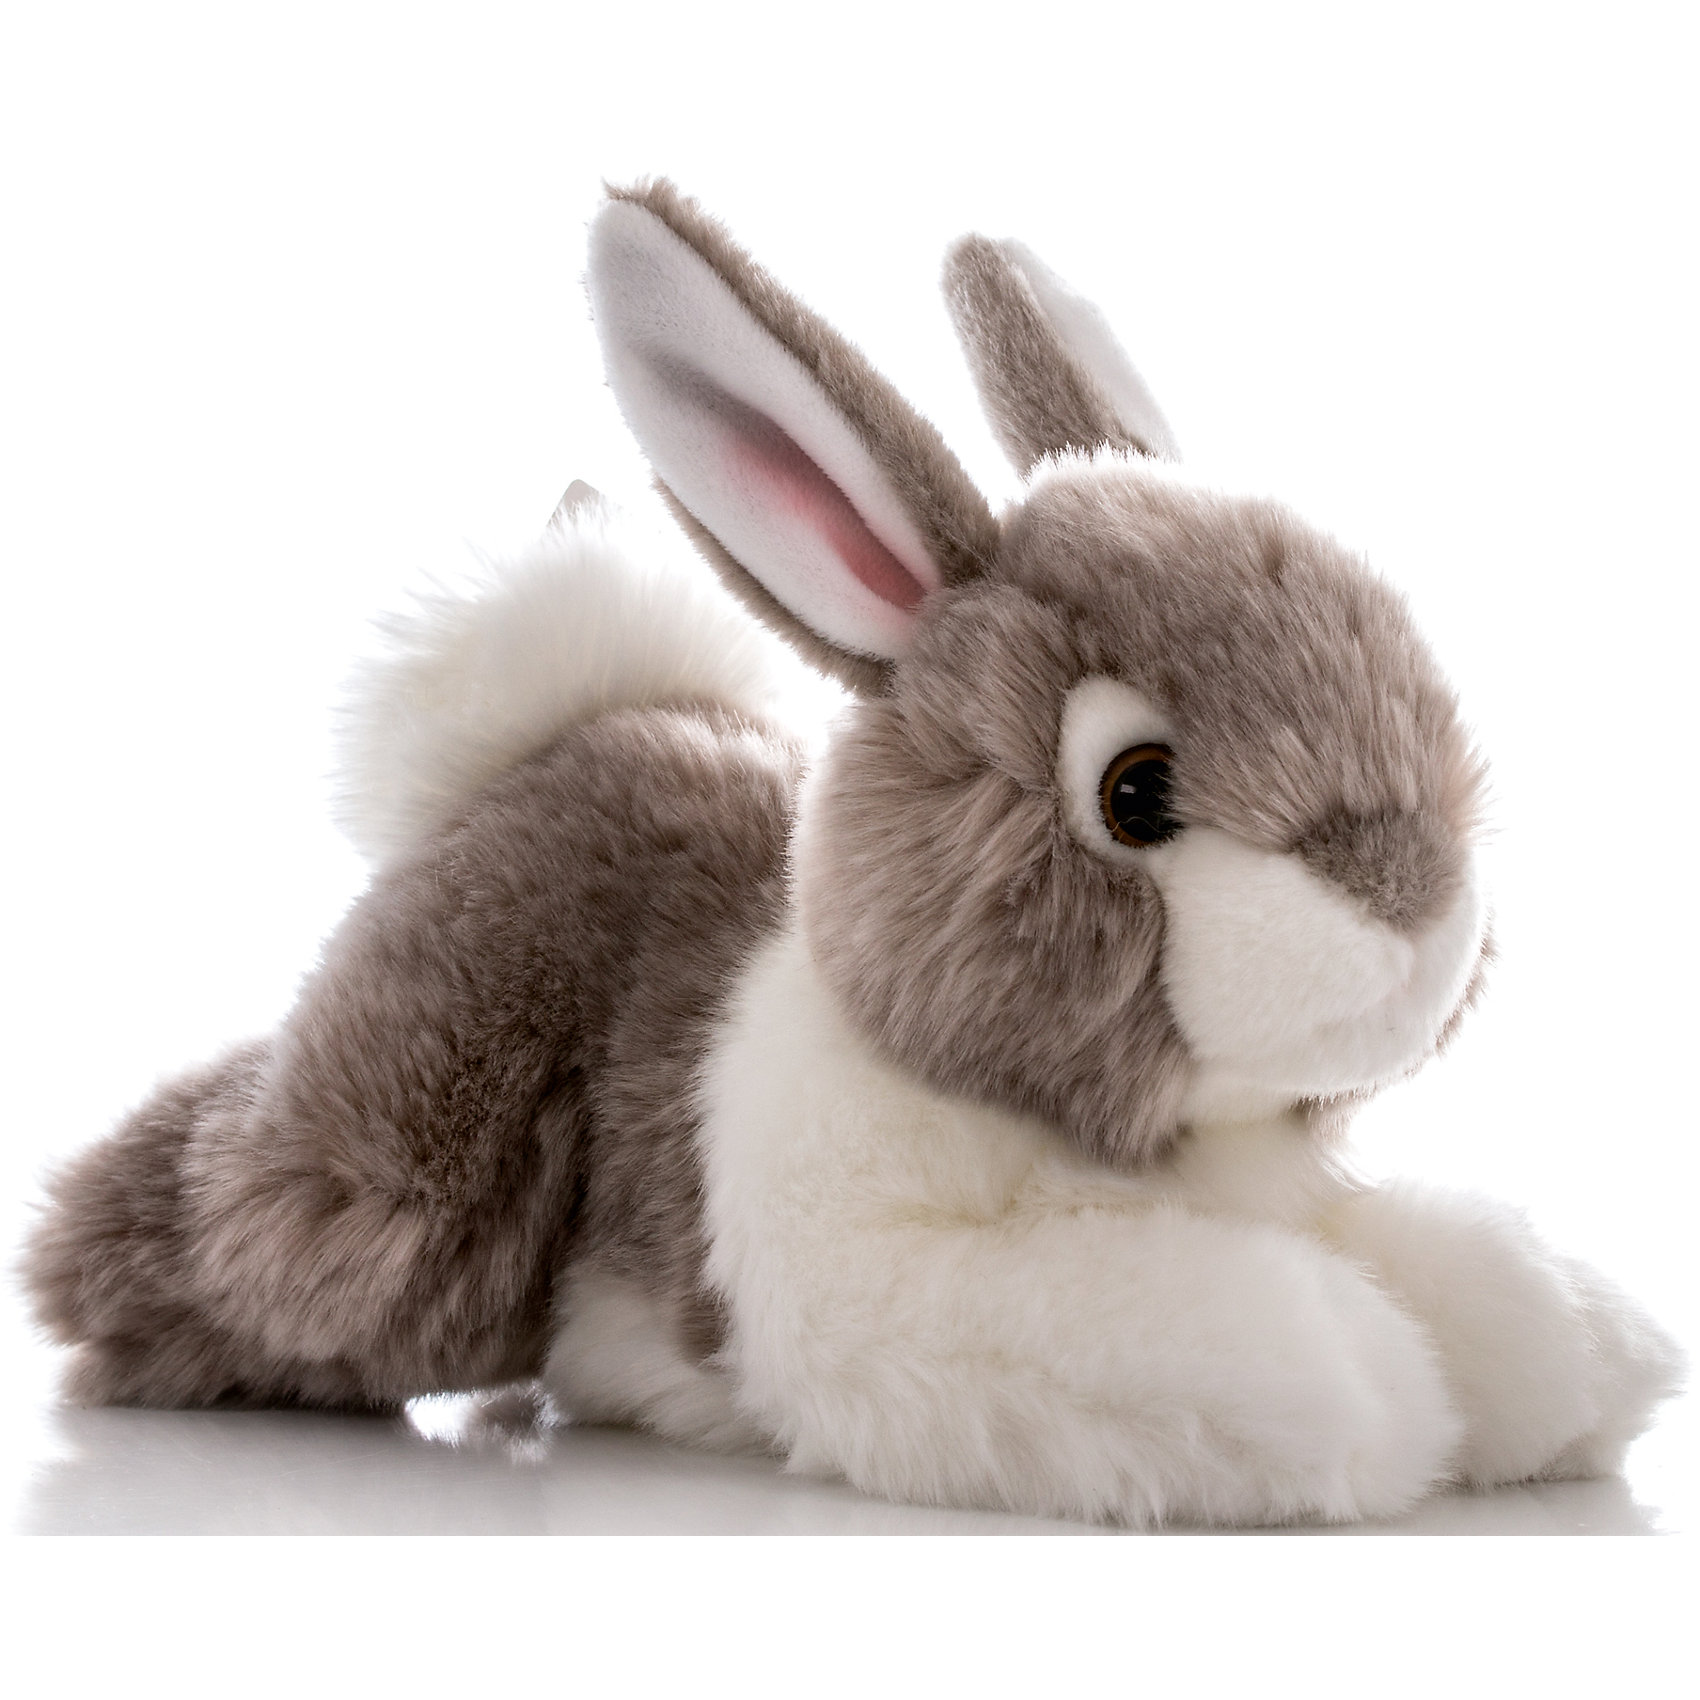 AURORA Мягкая игрушка Кролик серый, 28 см, AURORA aurora мягкая игрушка тигр 28 см